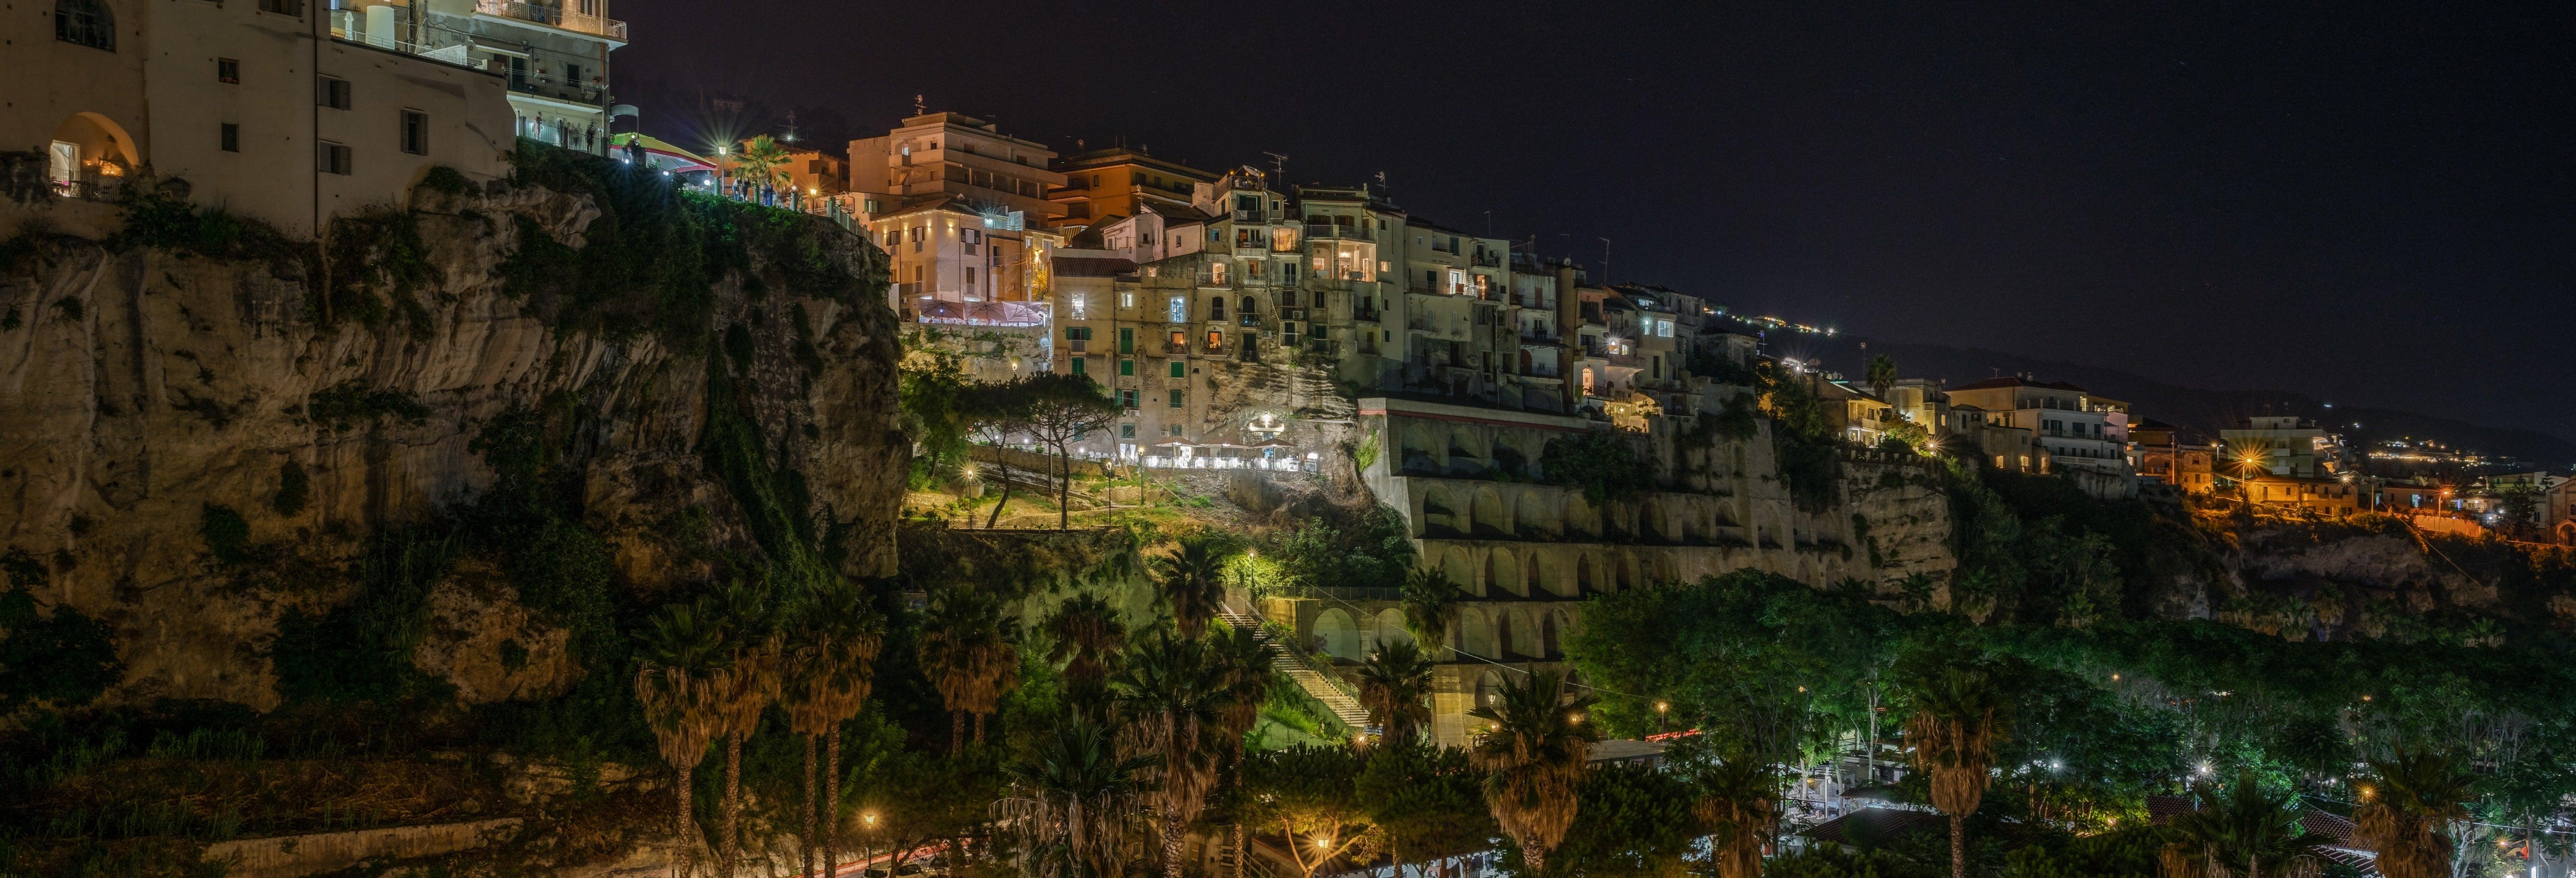 Tour noturno por Tropea